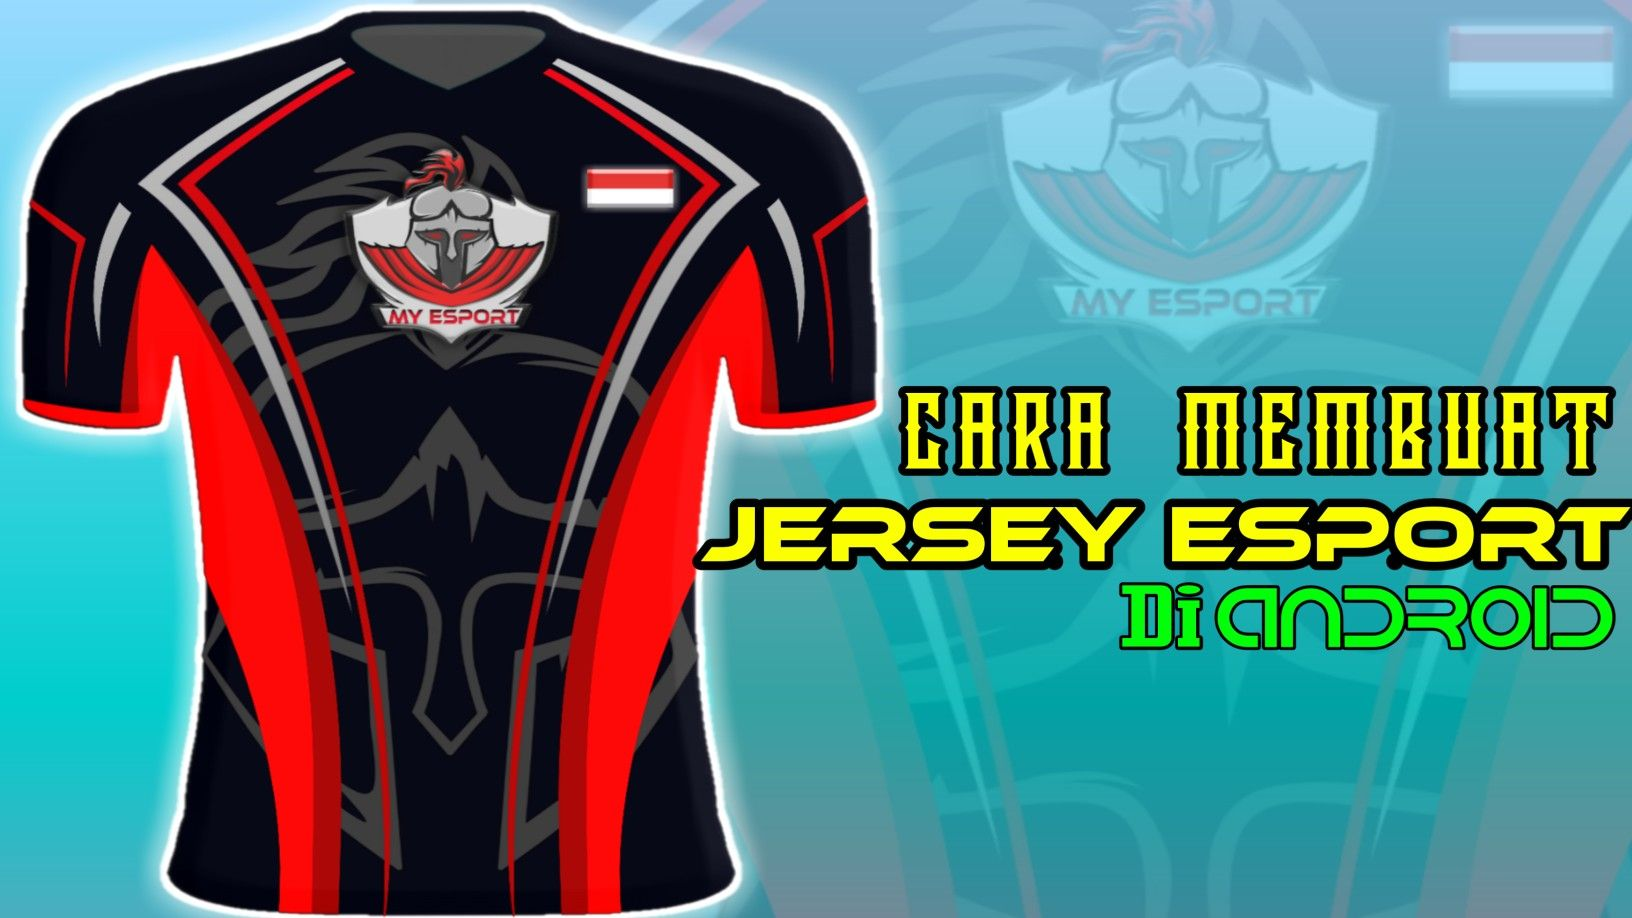 Design Jersey Esport Jersey T Shirt Kaos In 2020 T Shirt Logo Design How To Make Tshirts How To Make Logo